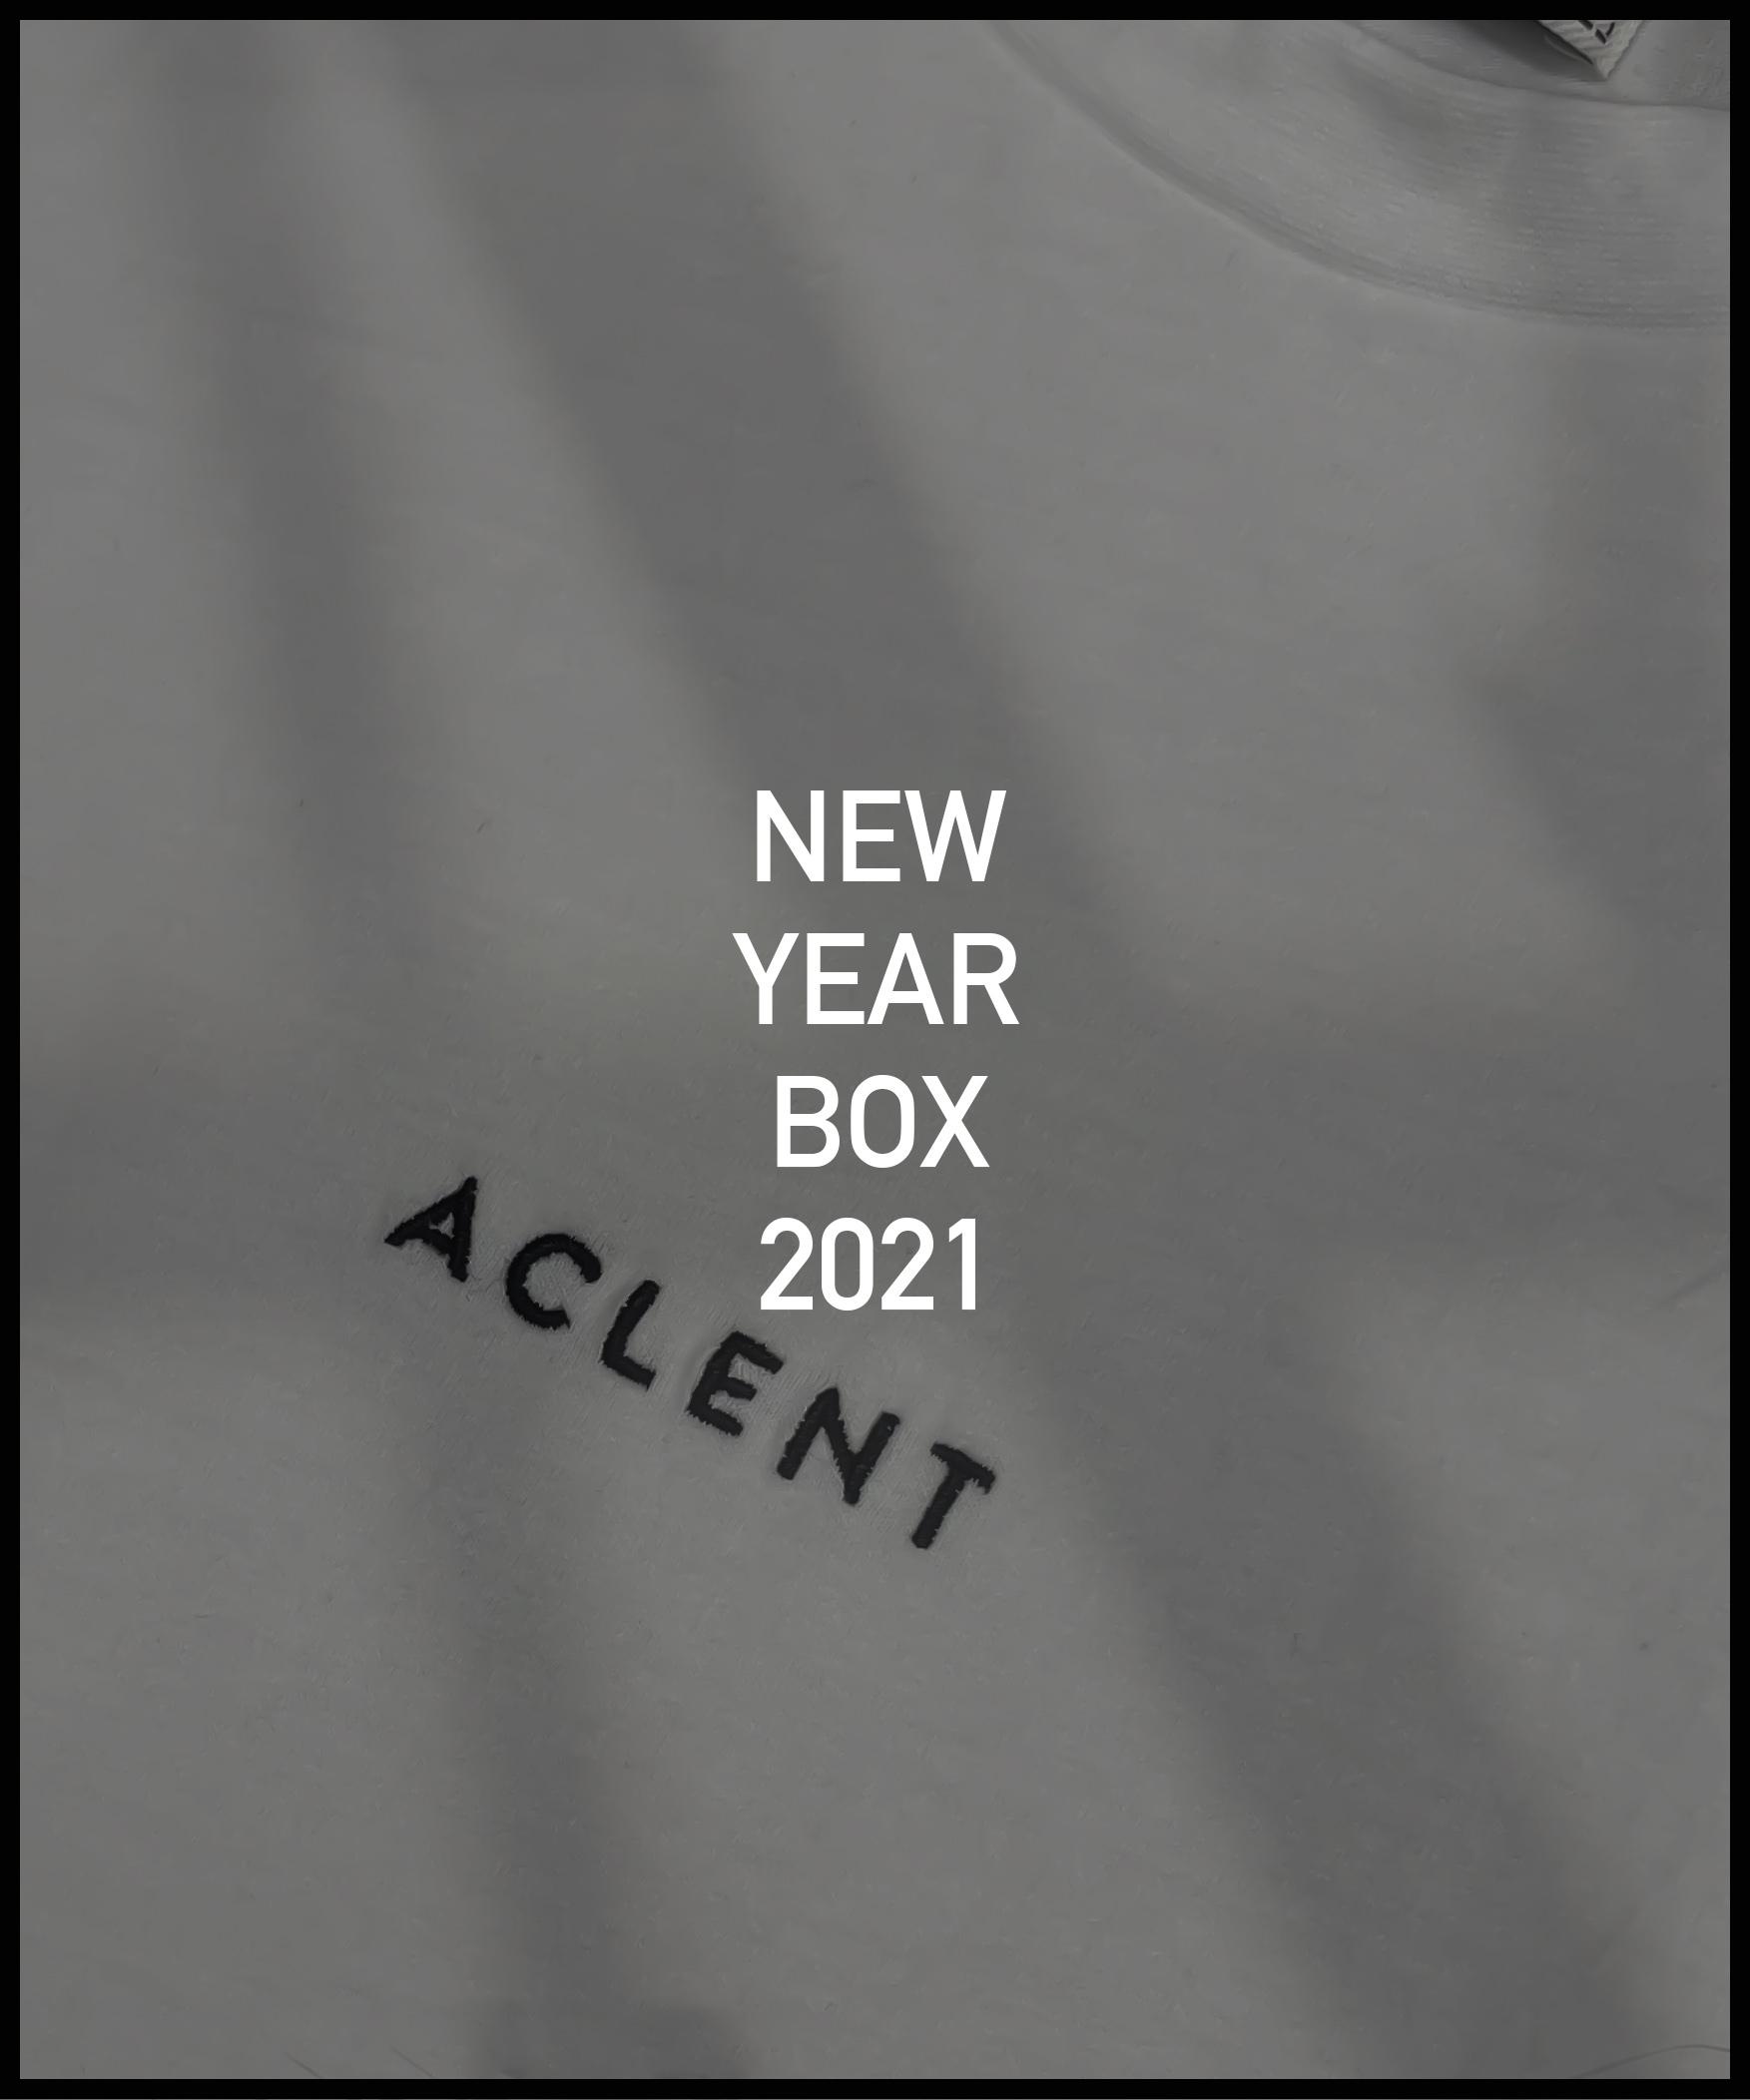 NEW YEAR BOX 2021